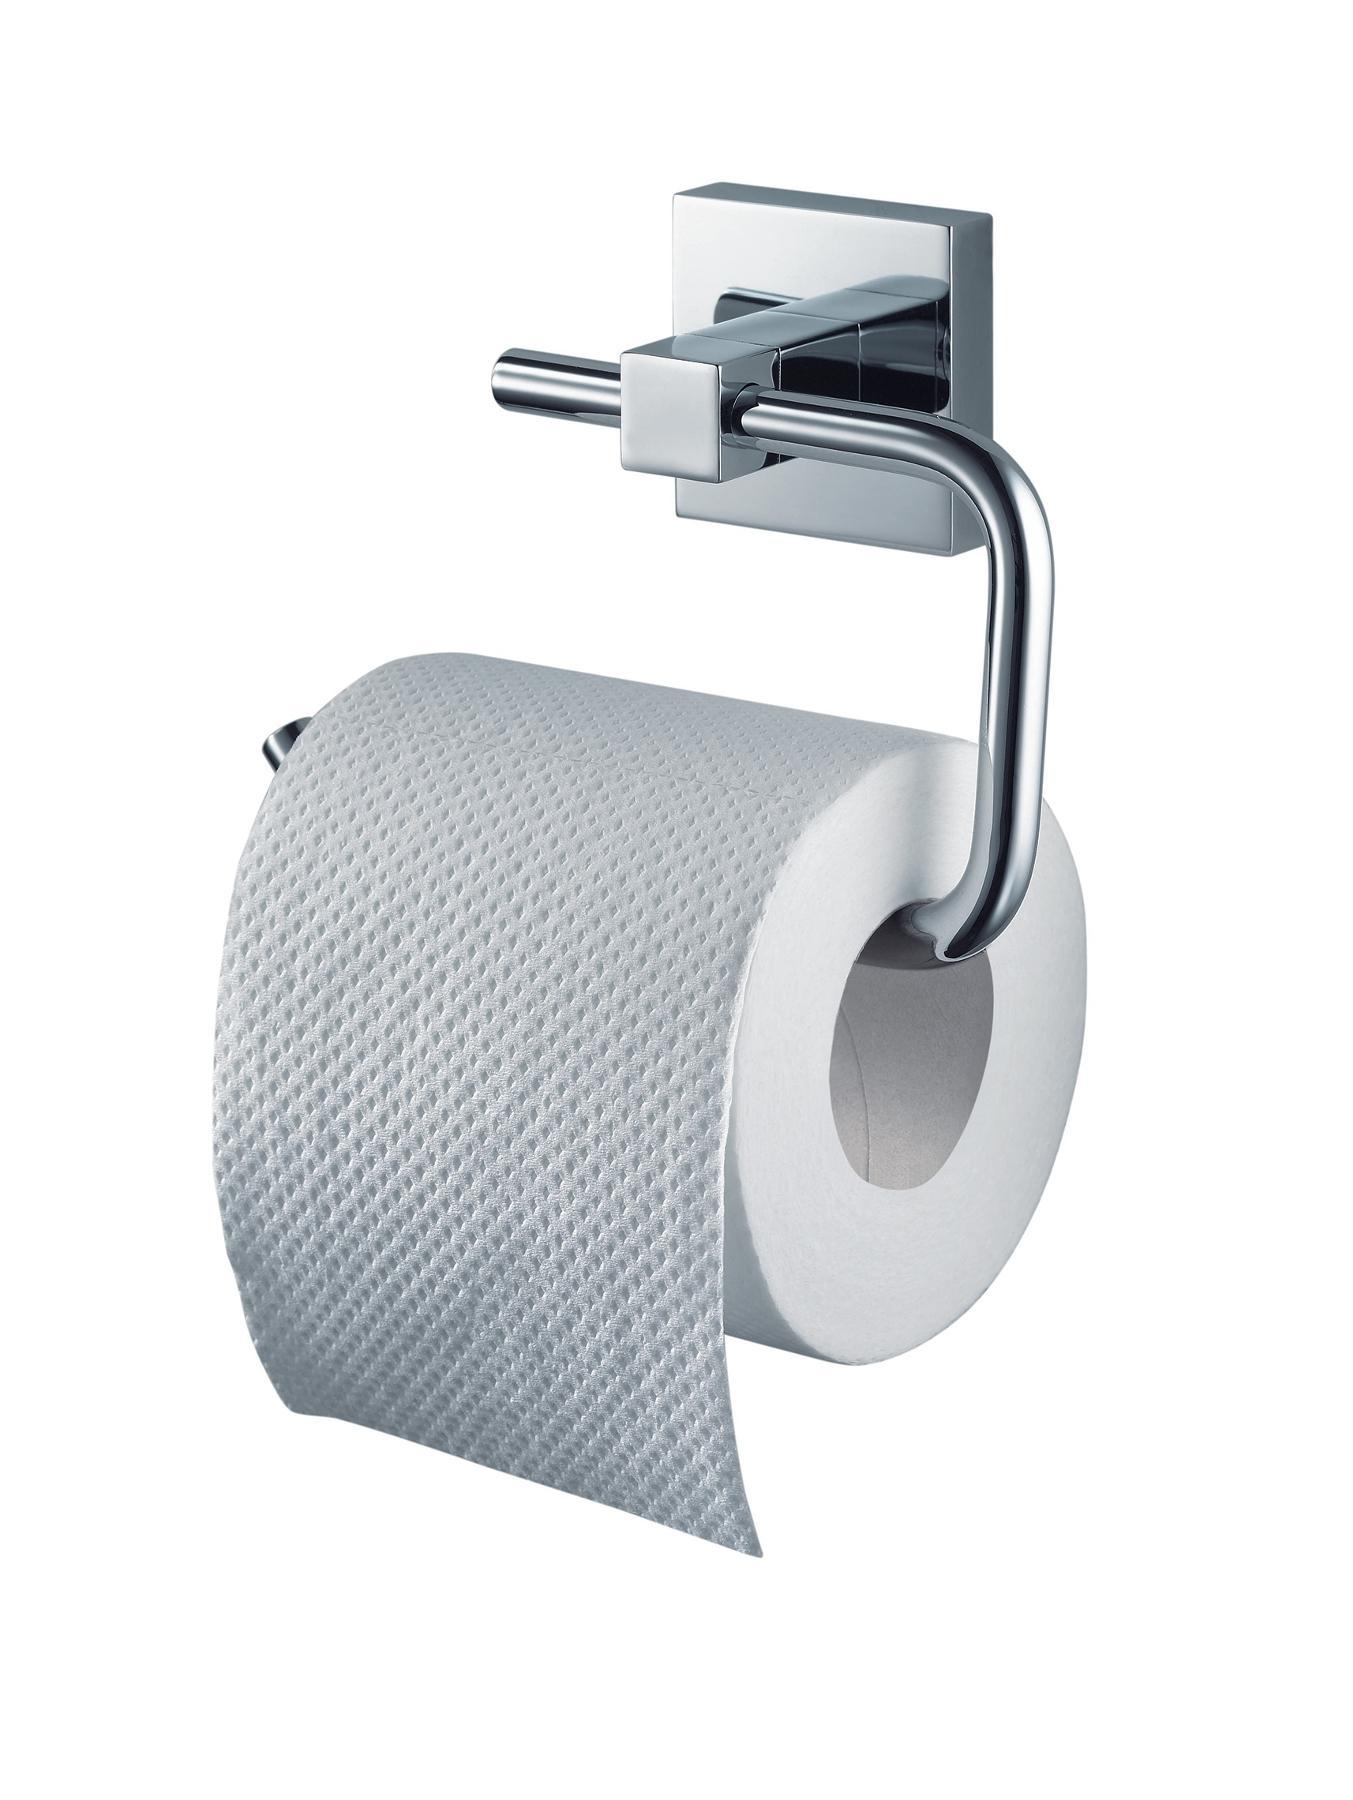 Mezzo Chrome Toilet Roll Holder